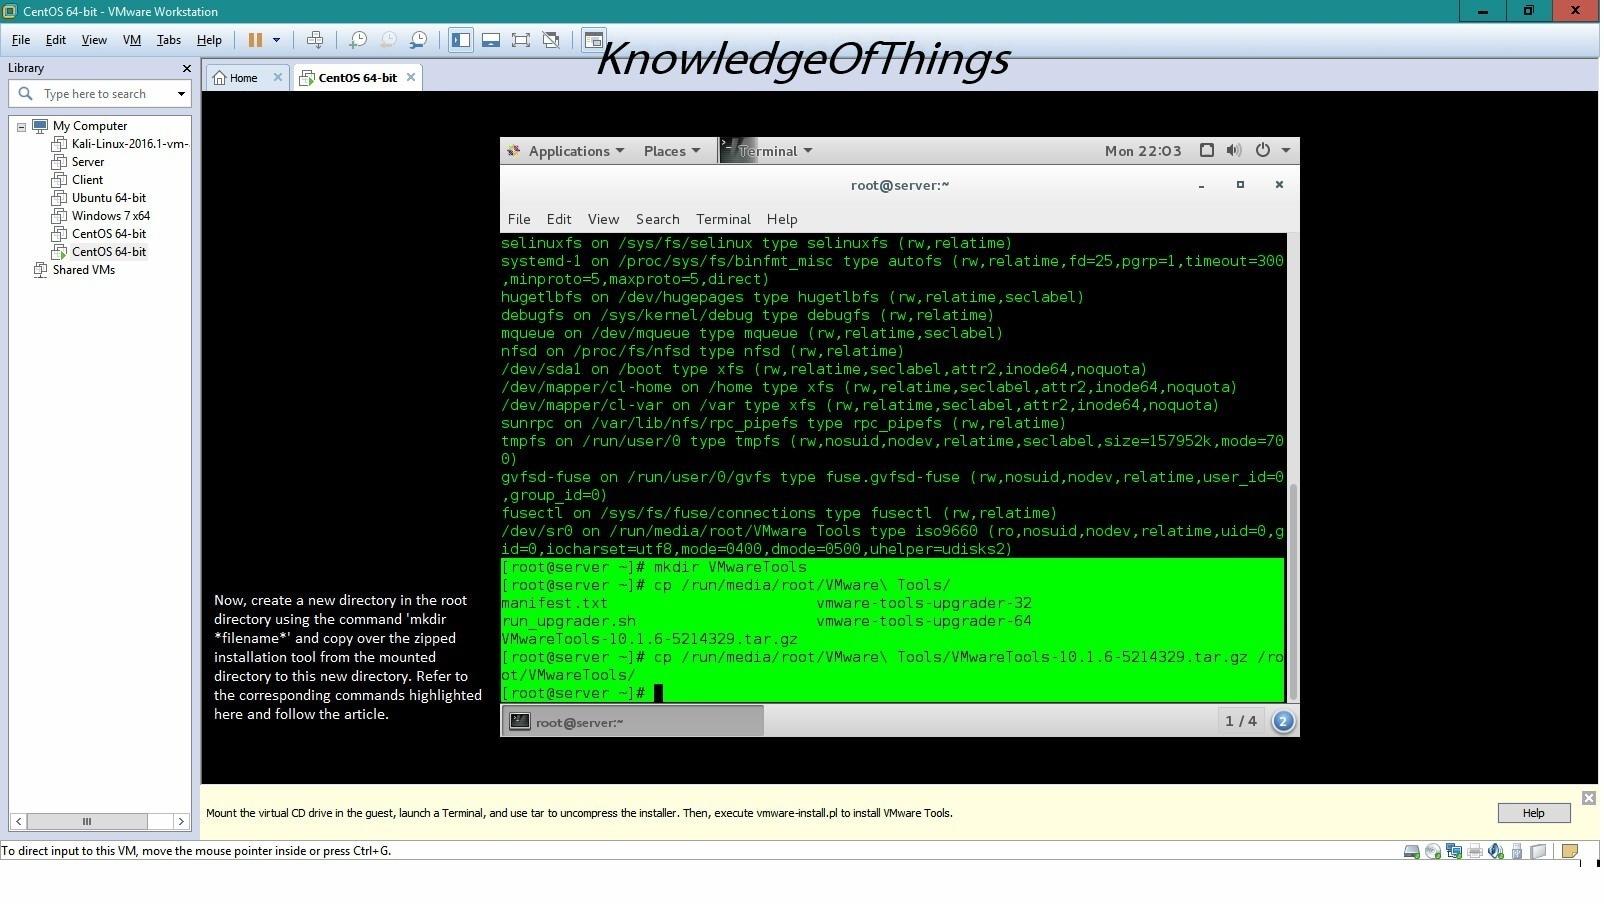 Install CentOS 7 as a Virtual Machine using VMware